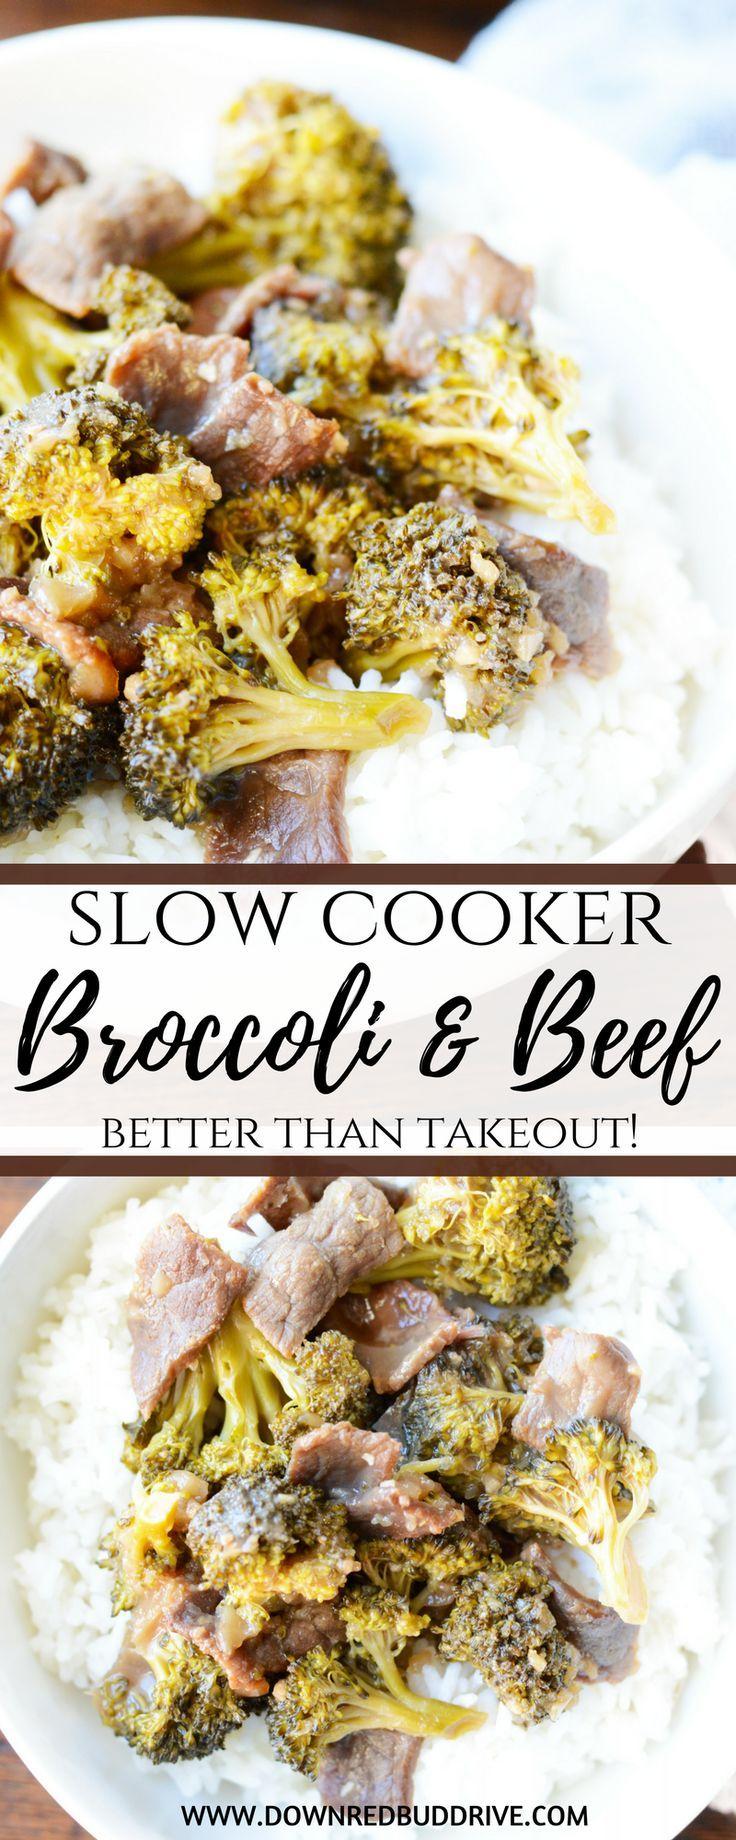 Broccoli beef broccoli and beef chinese food recipe stir fry broccoli beef broccoli and beef chinese food recipe stir fry recipe crockpot chinese broccoli and beef recipe slow cooker chinese s forumfinder Choice Image